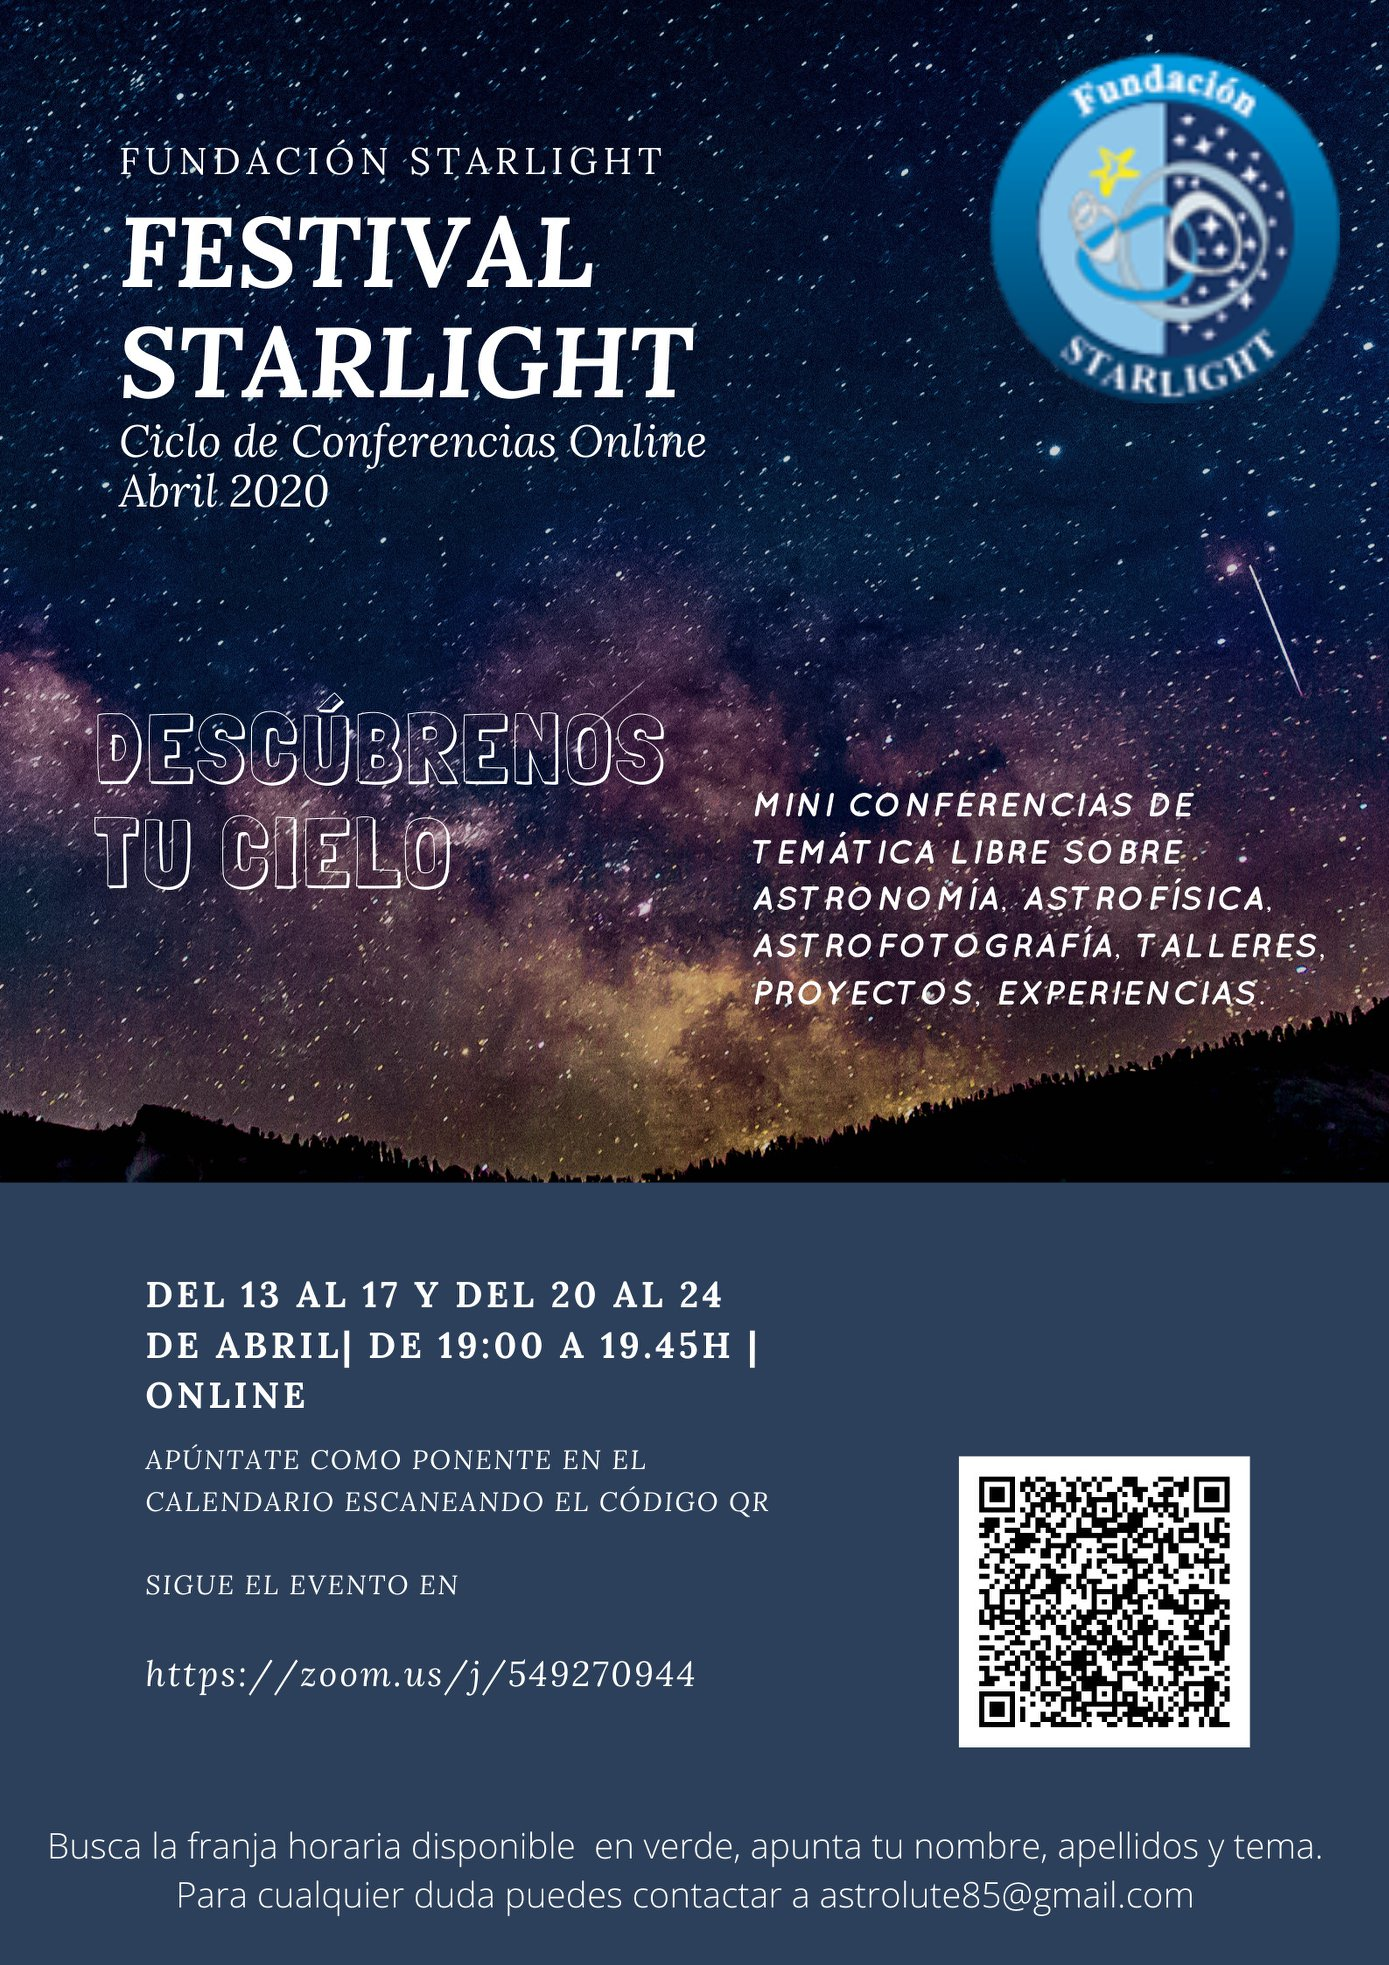 Fundacion_Starlight